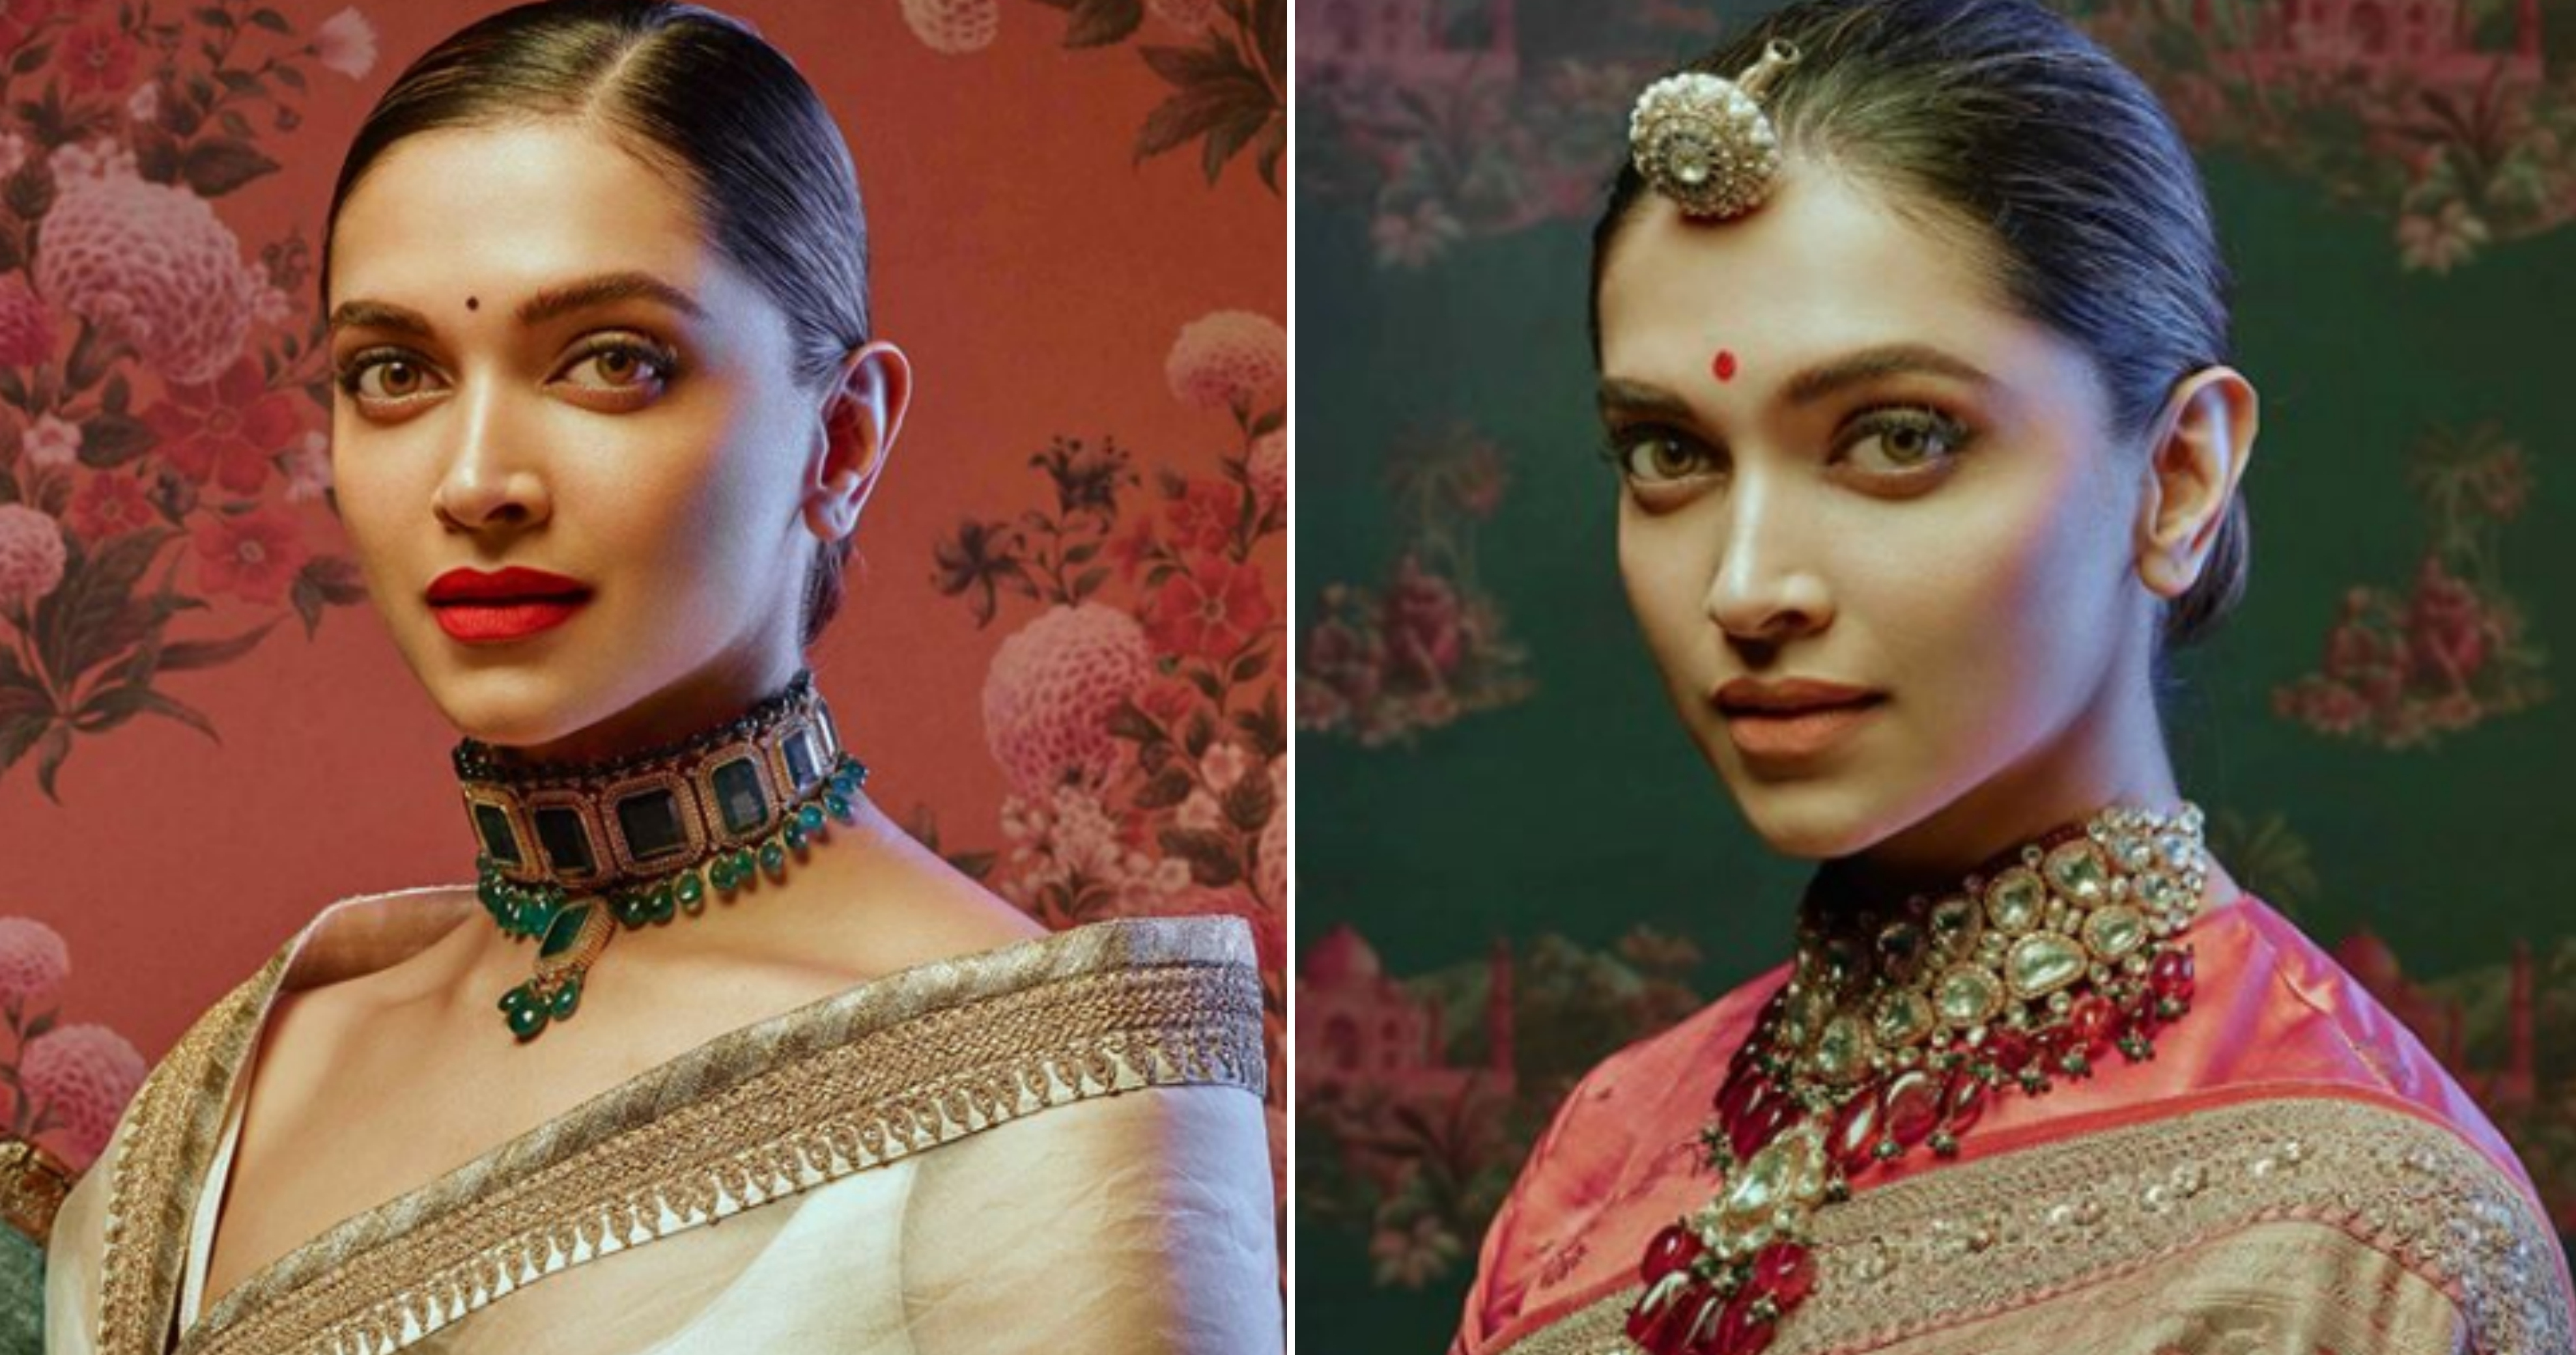 Deepika Padukone Looks Eternally Regal In Sabyasachi's Latest Collection!